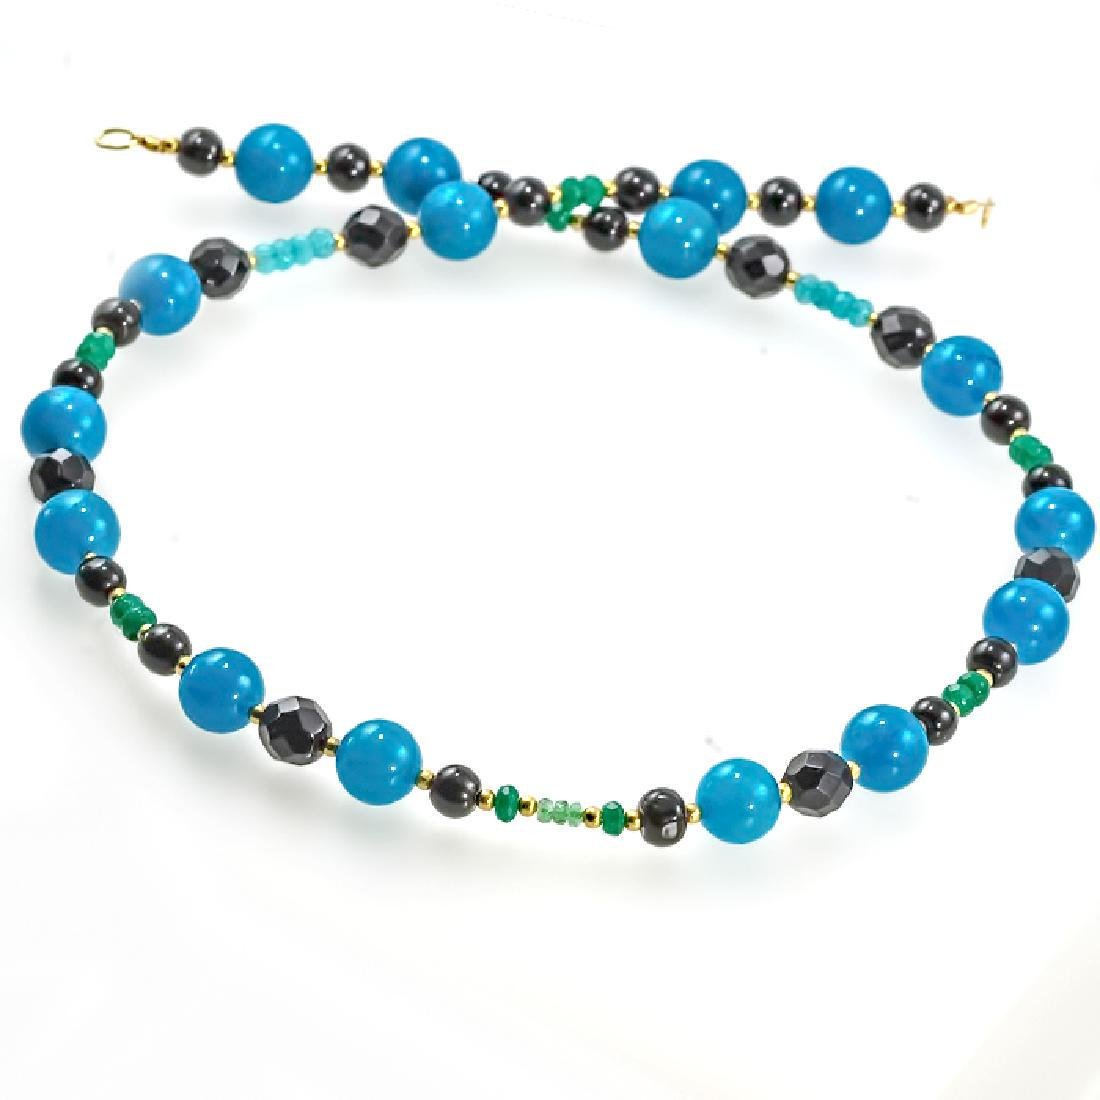 Jade Necklace with Emeralds, Aquamarine, Black and - 2